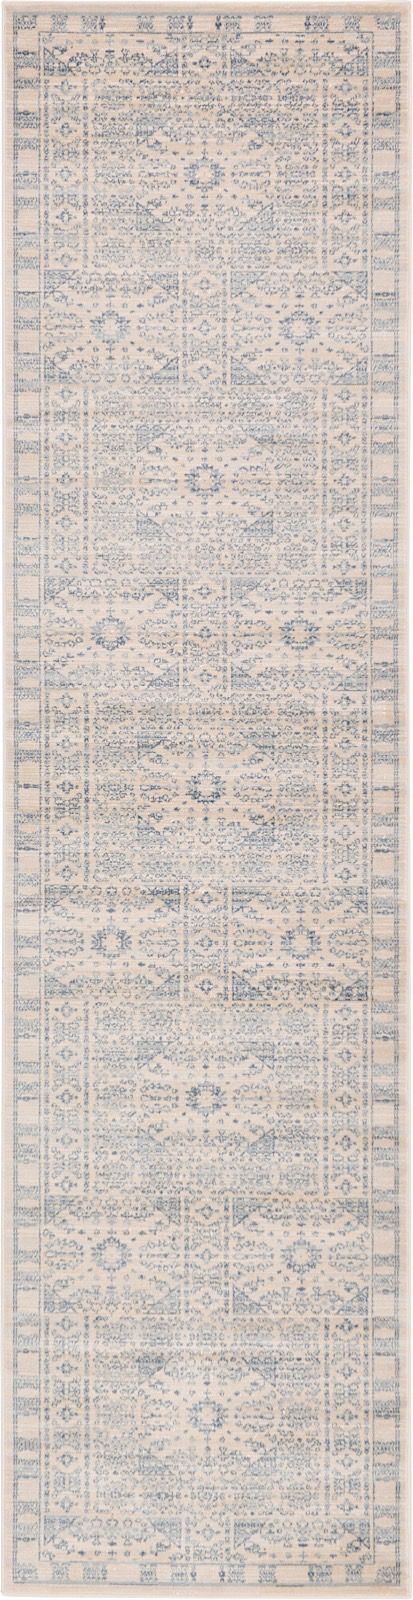 nantes transitional area rug collection